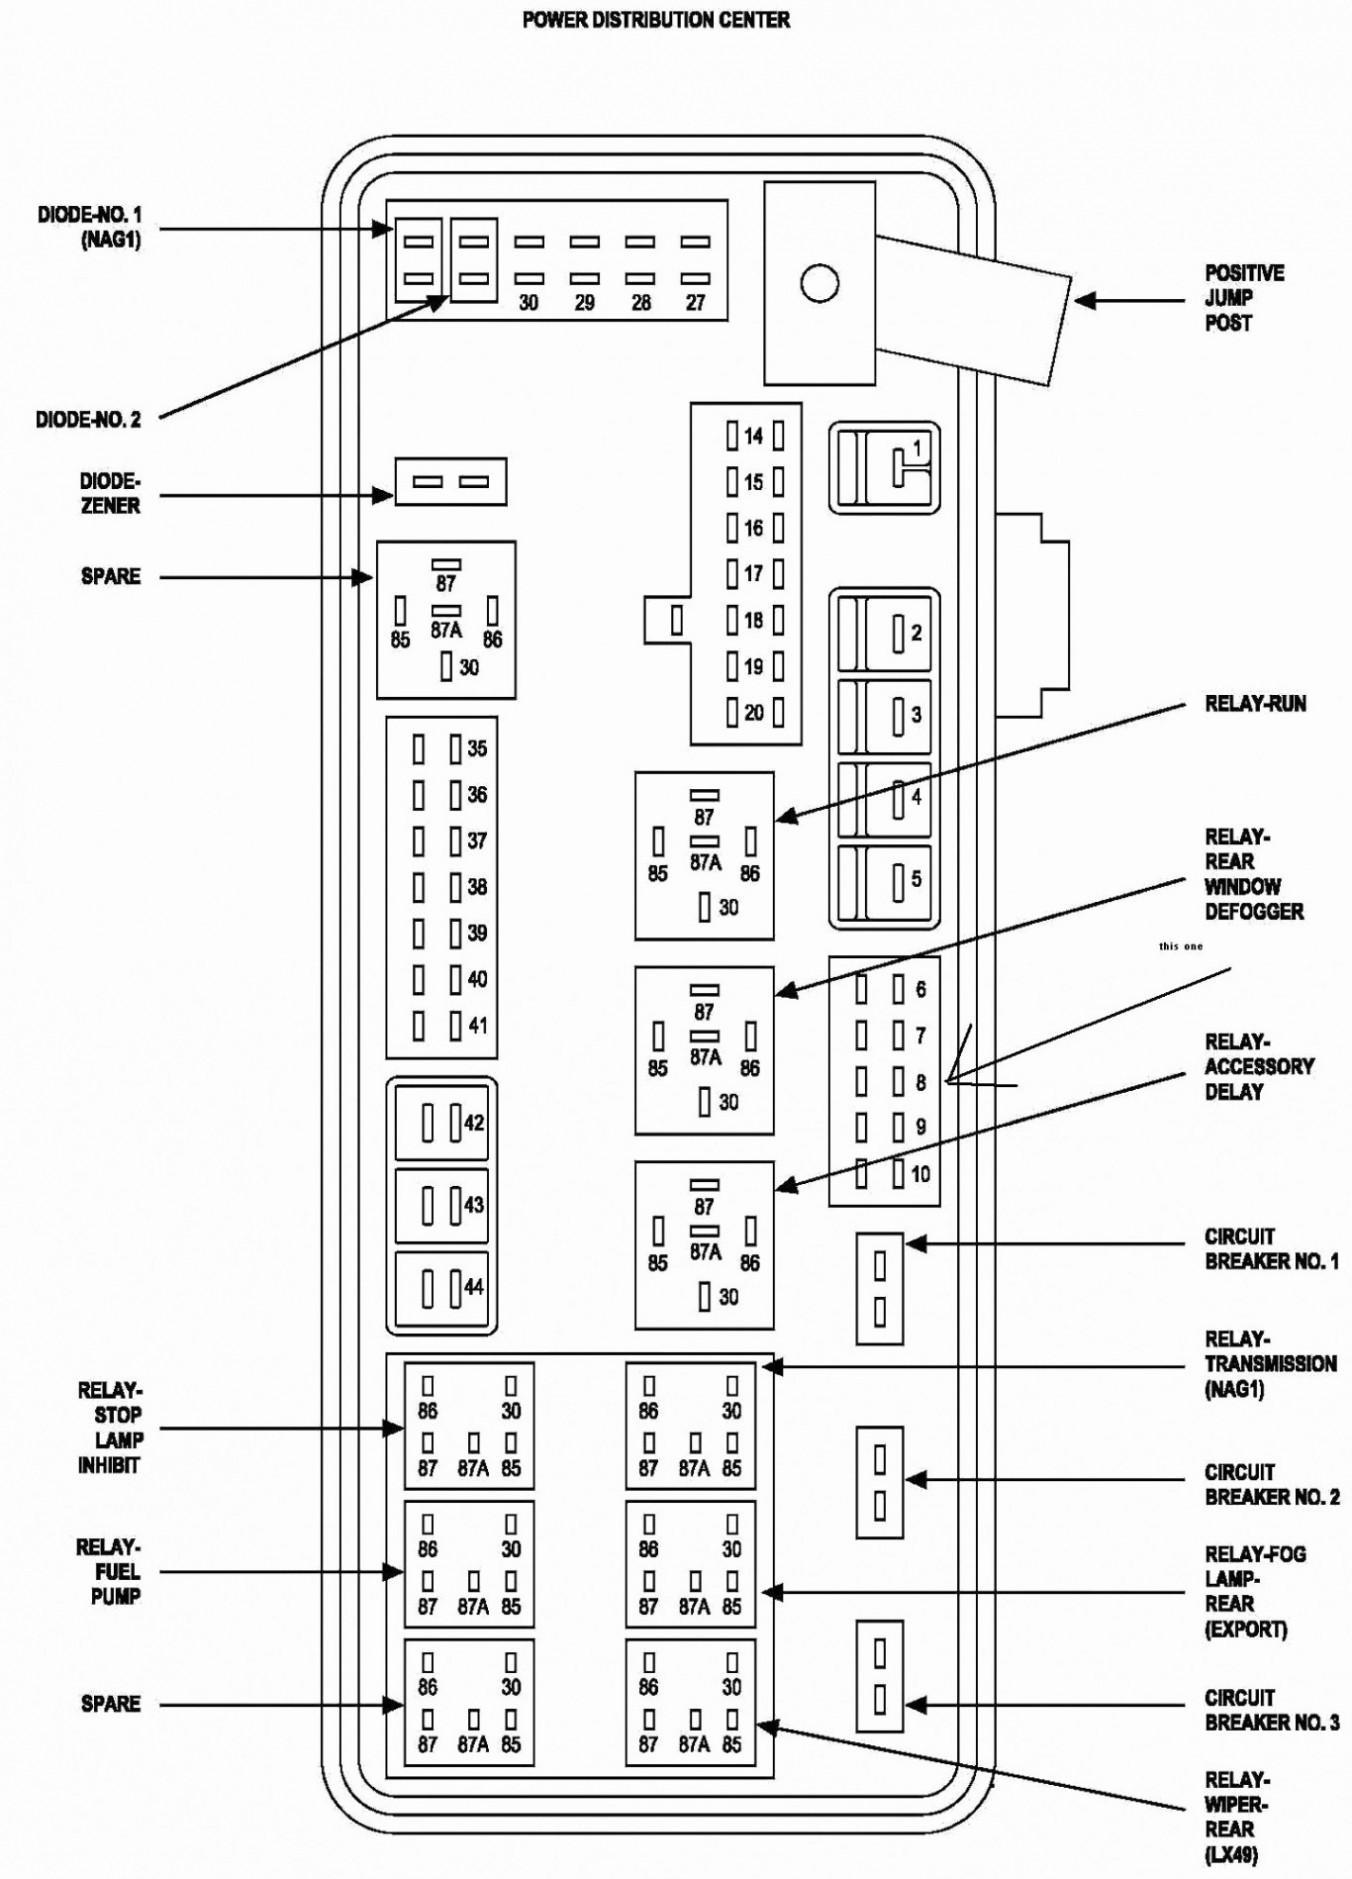 fuse box diagram peugeot 207